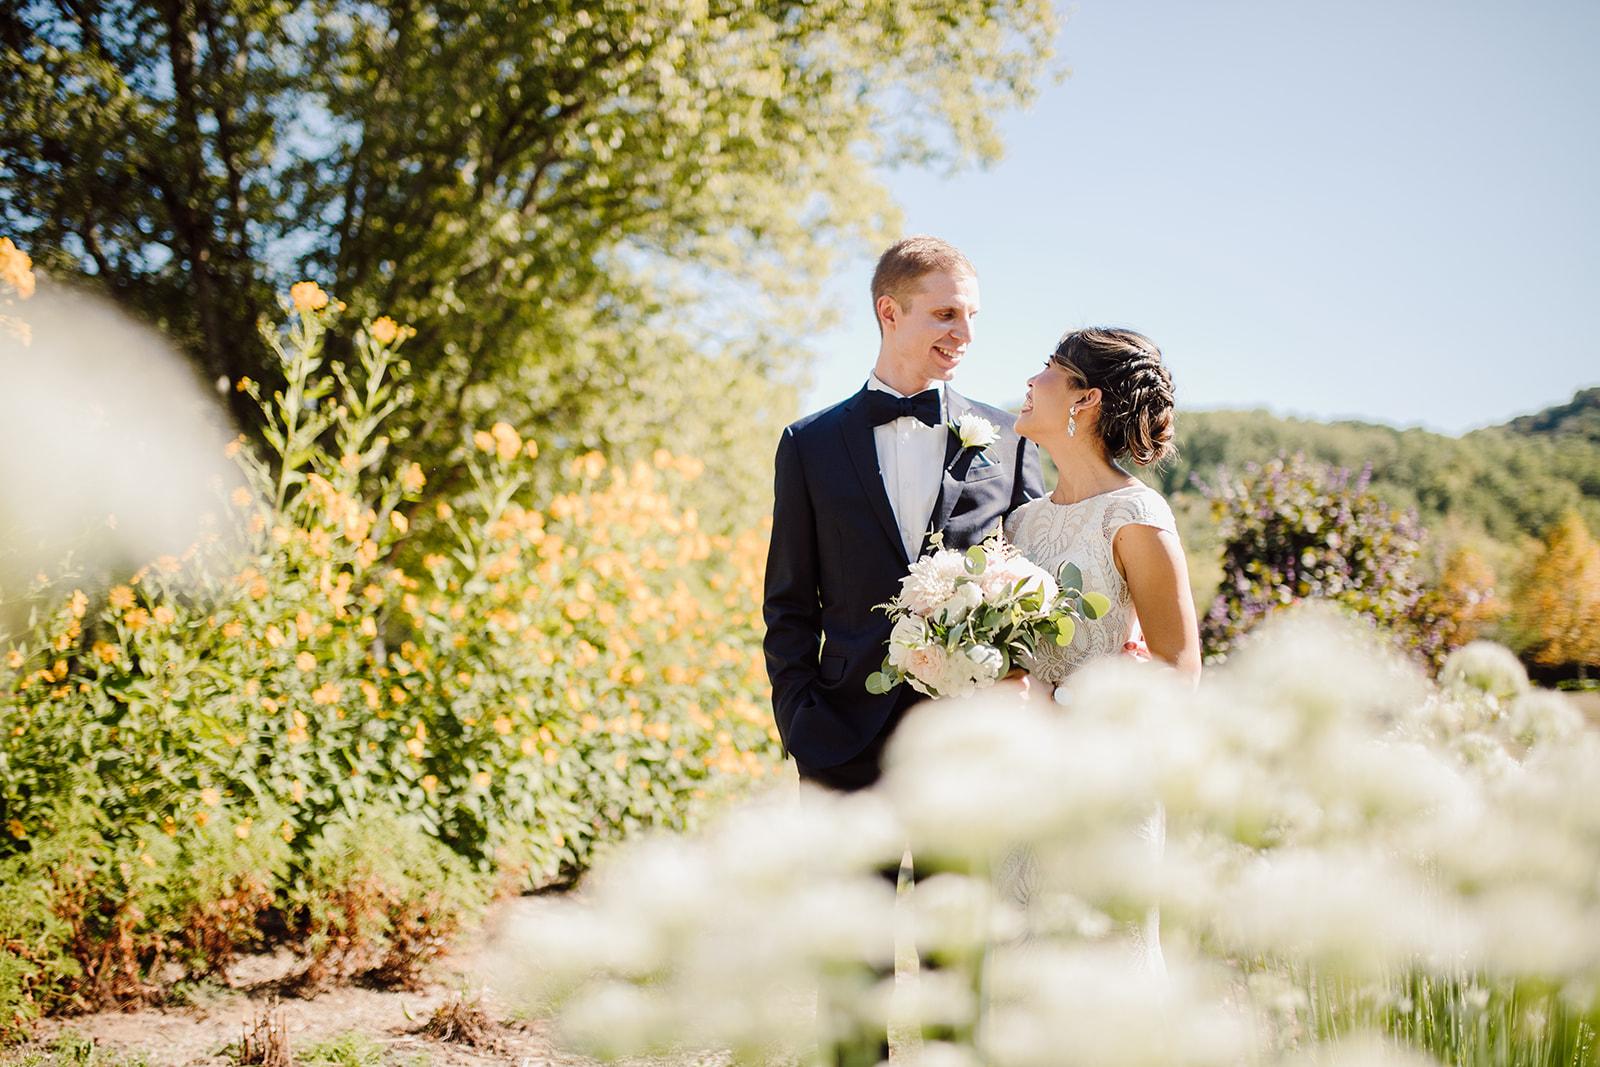 Jamie Pratt Photos outdoor wedding photography